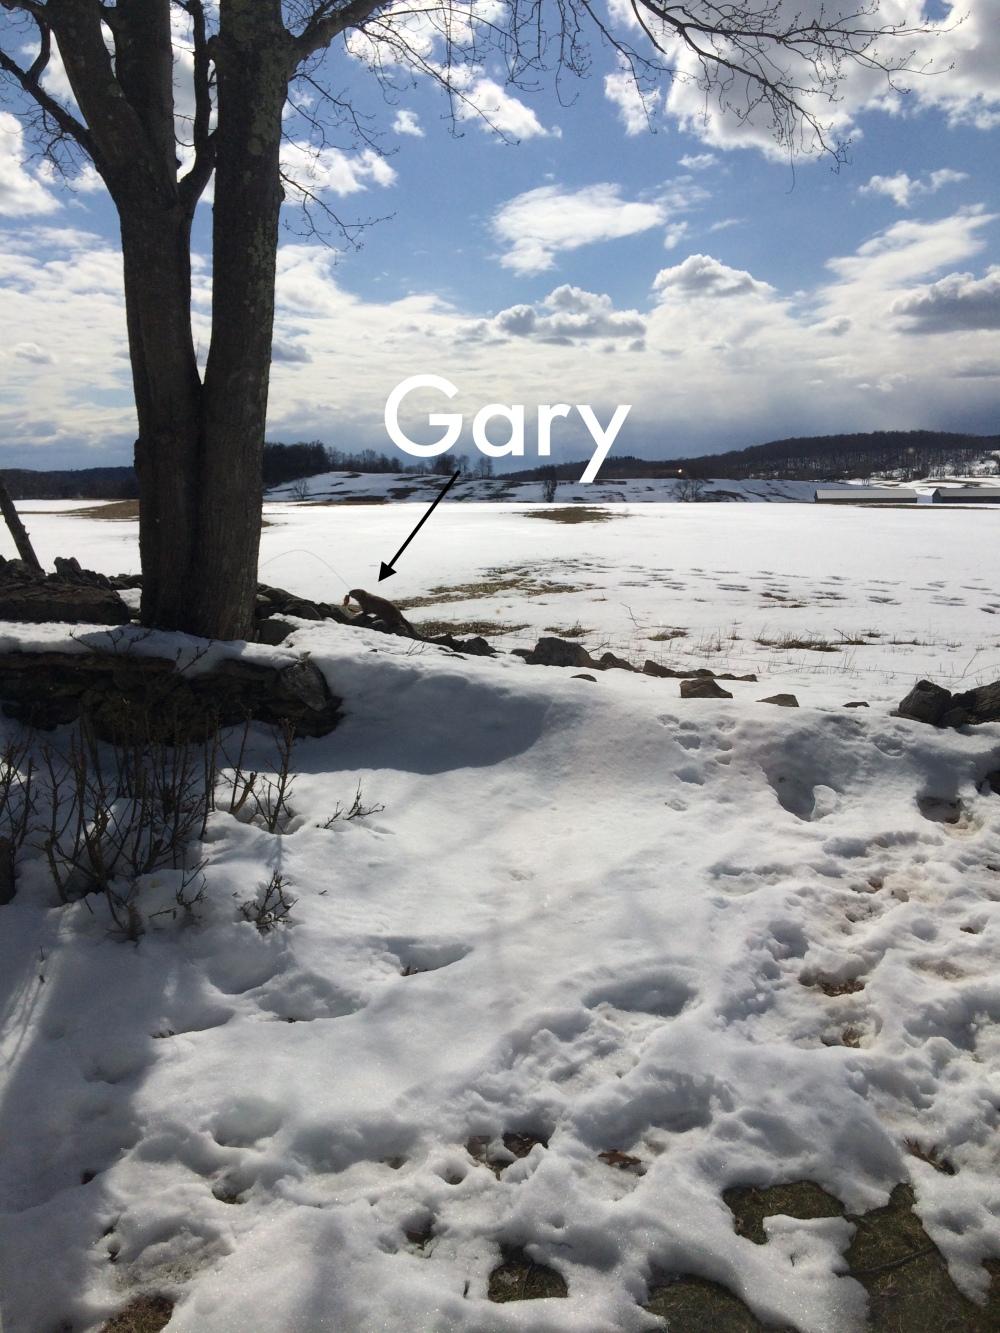 Gary Day 1.JPG